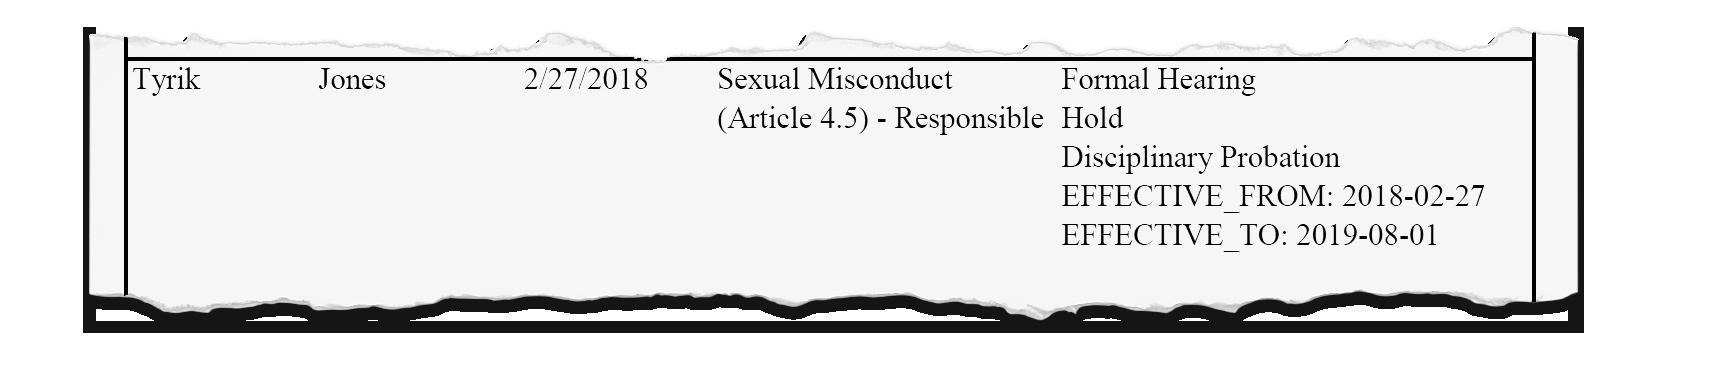 Tyrik Jones disciplinary records.